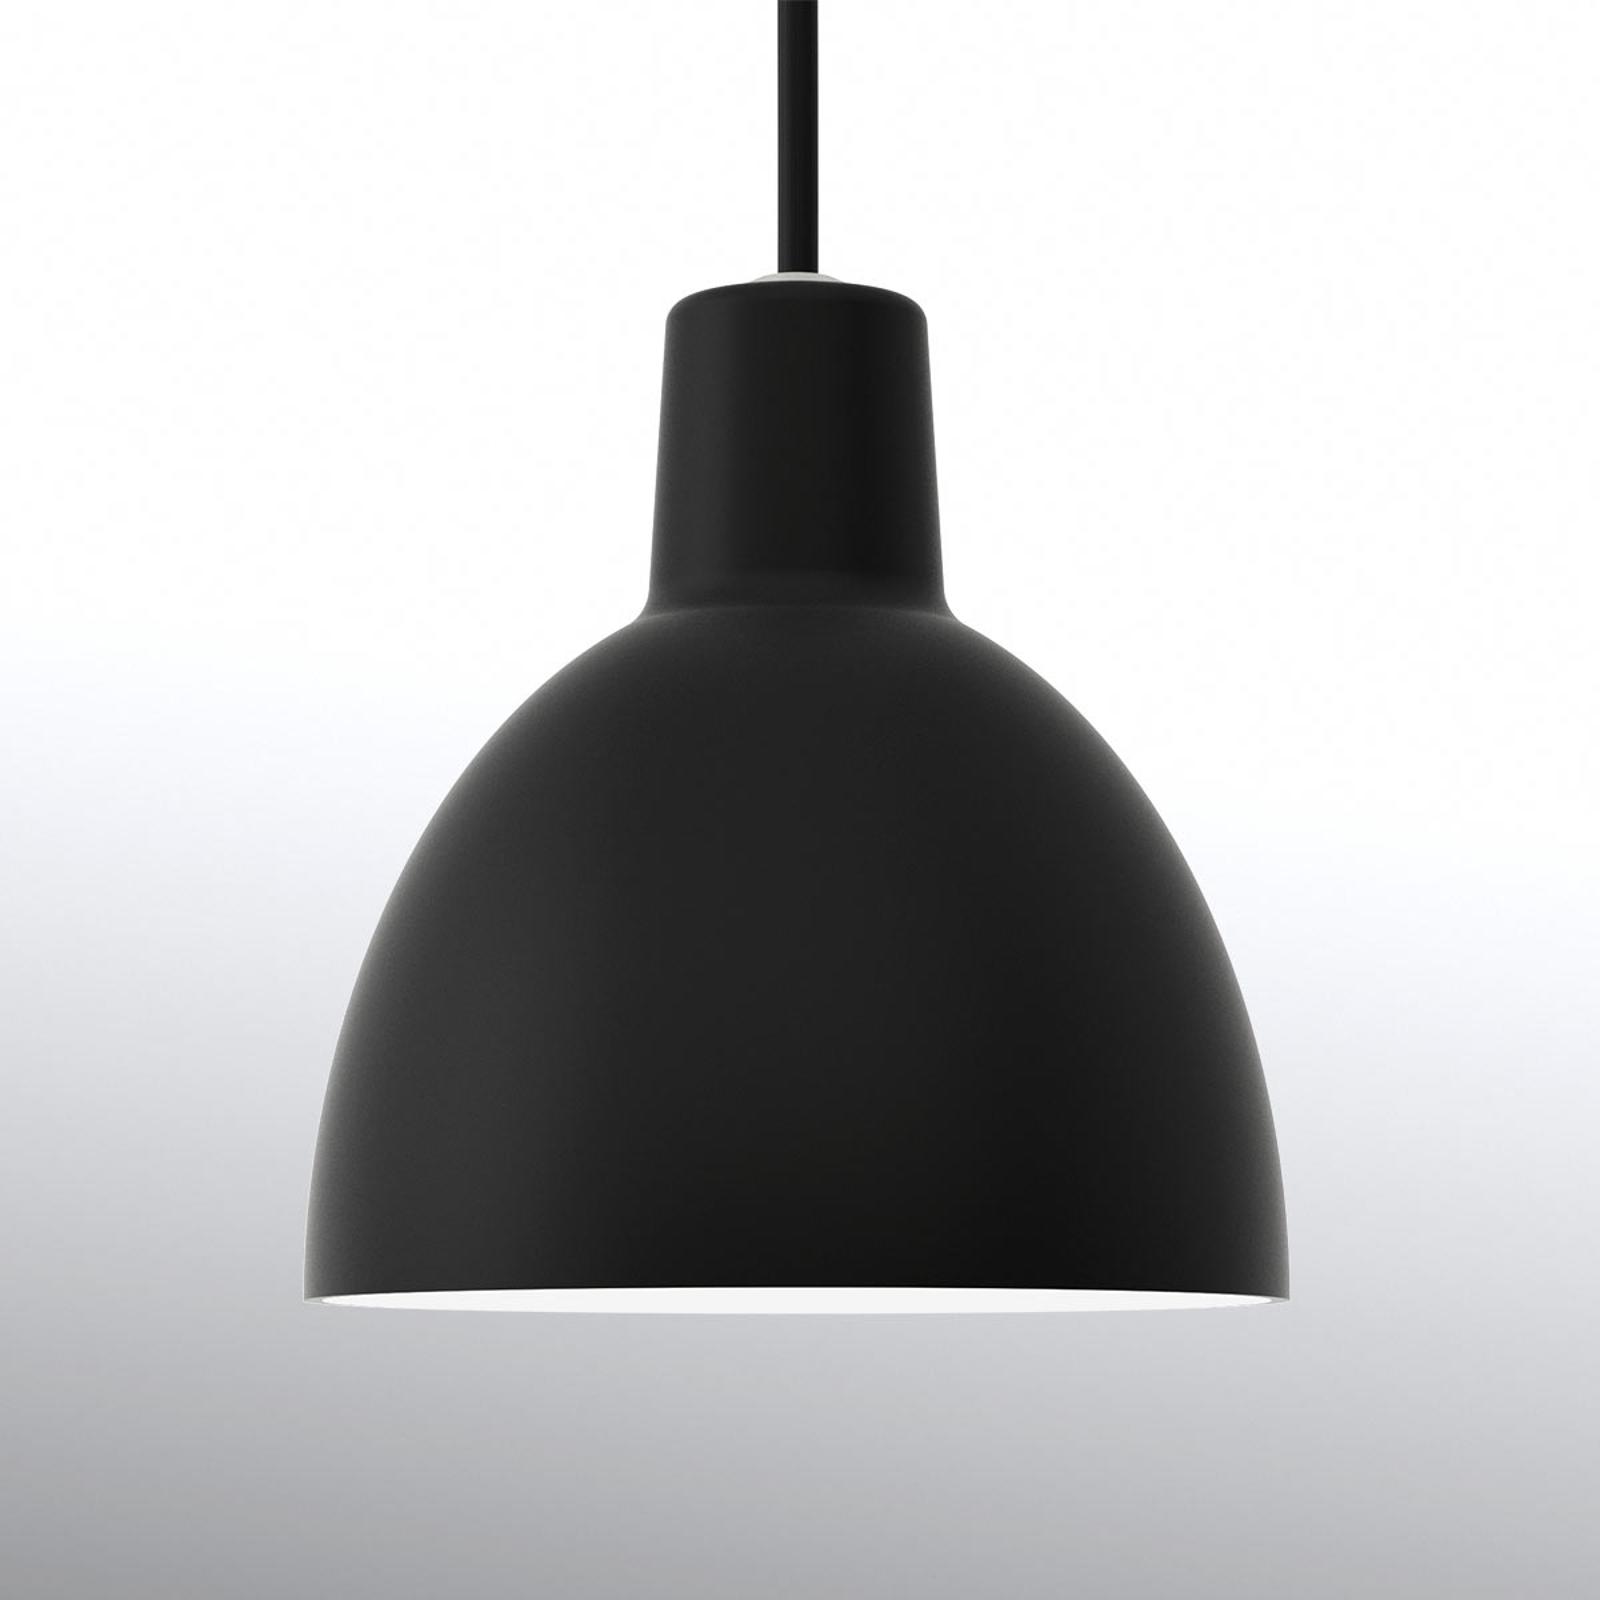 Louis Poulsen Toldbod120, lampada nera